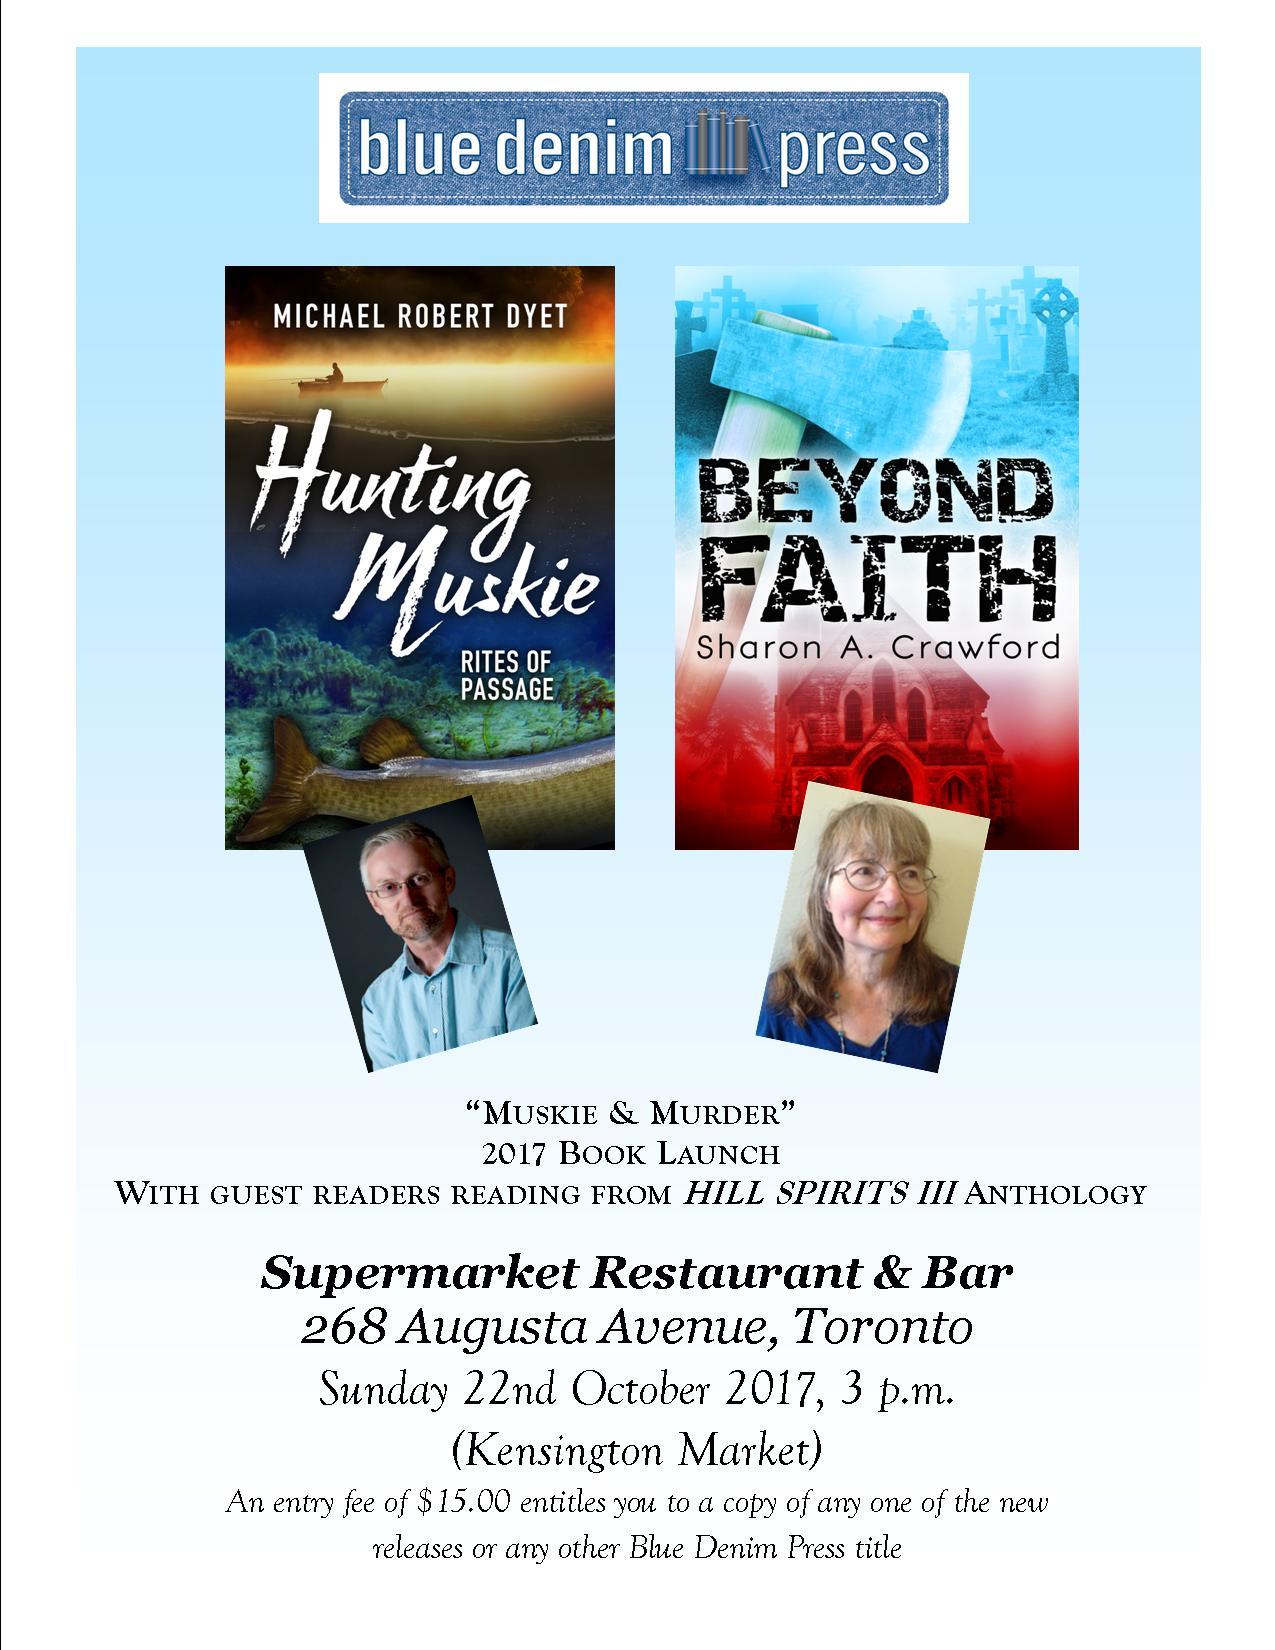 Book Launch Small Poster Toronto  2017.jpg